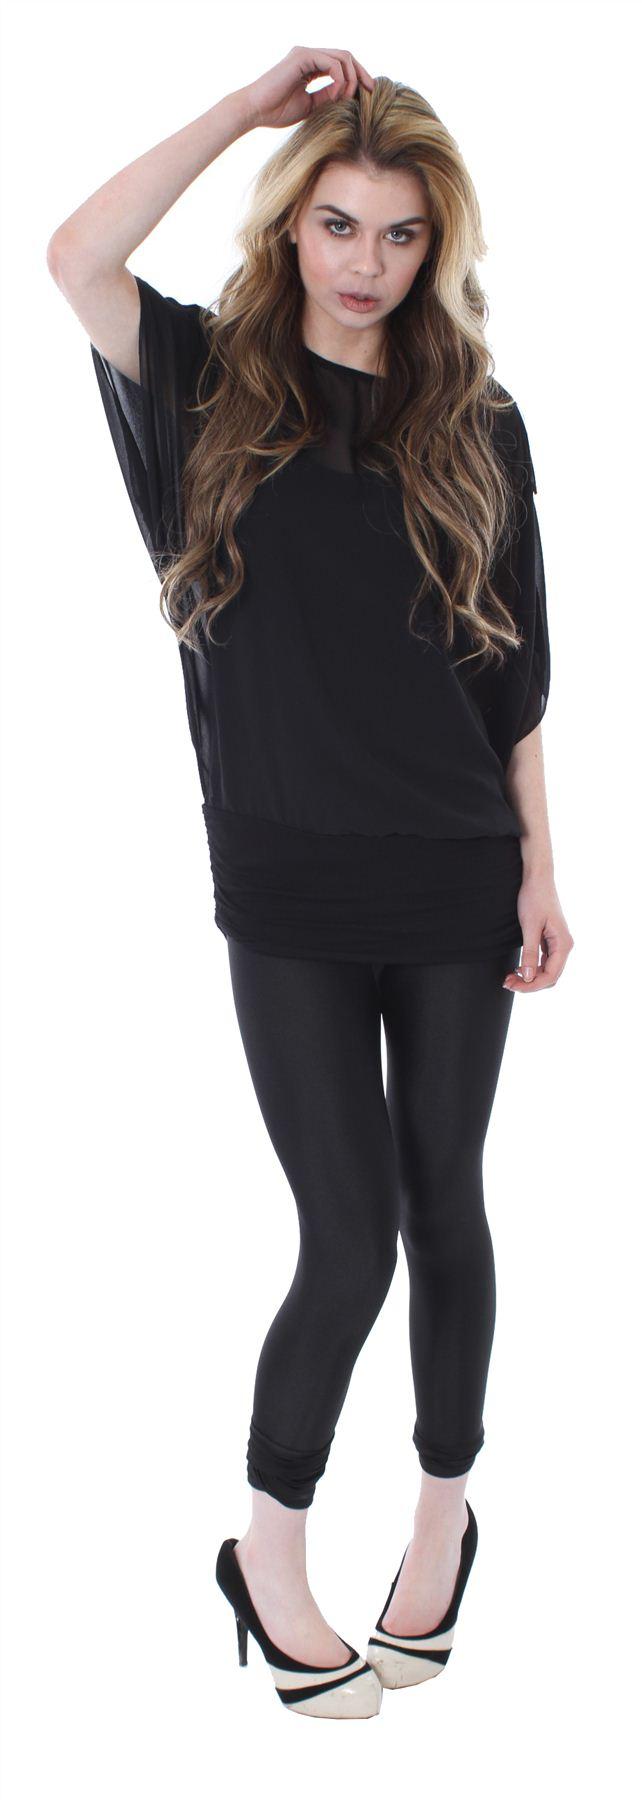 New-Womens-Plus-Size-2-In-1-Jersey-Chiffon-Batwing-Tunic-Tops-8-26